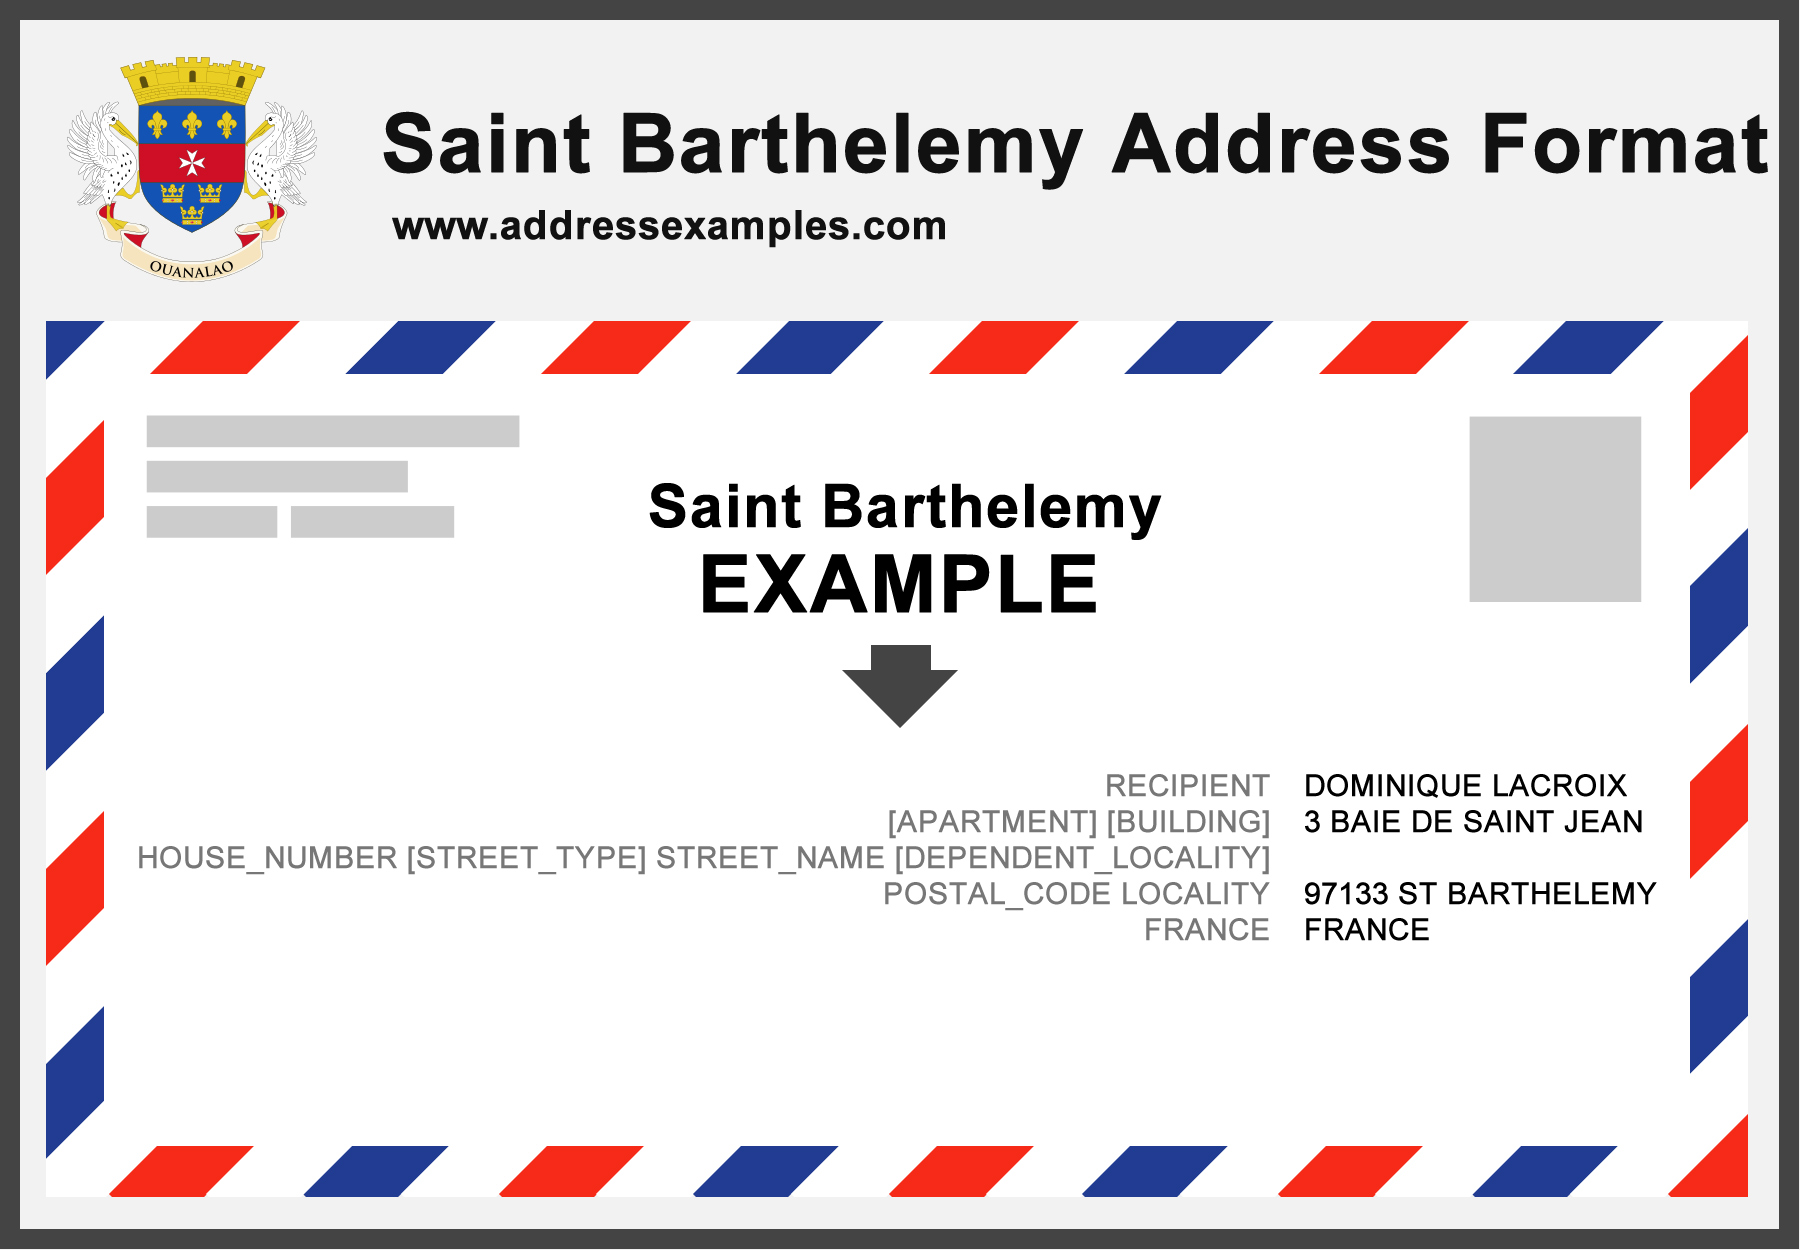 Saint Barthelemy Address Format